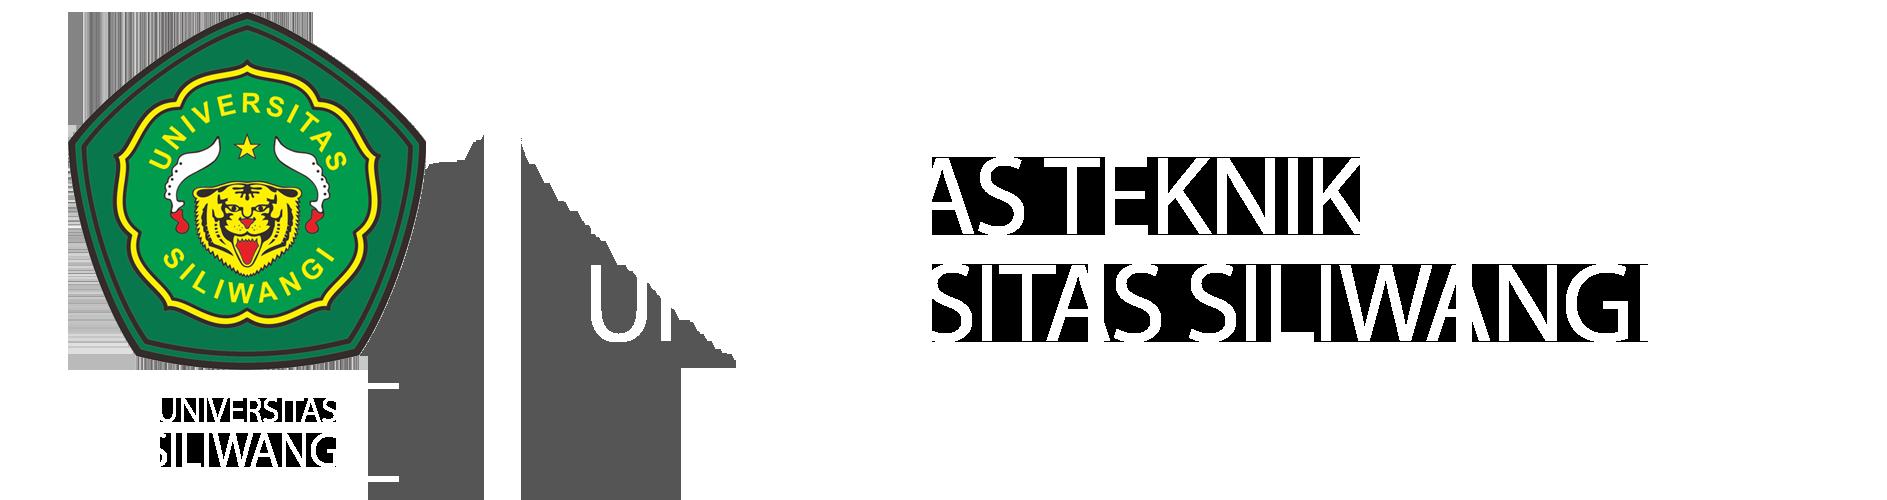 Website Resmi Fakultas Teknik Universitas Siliwangi